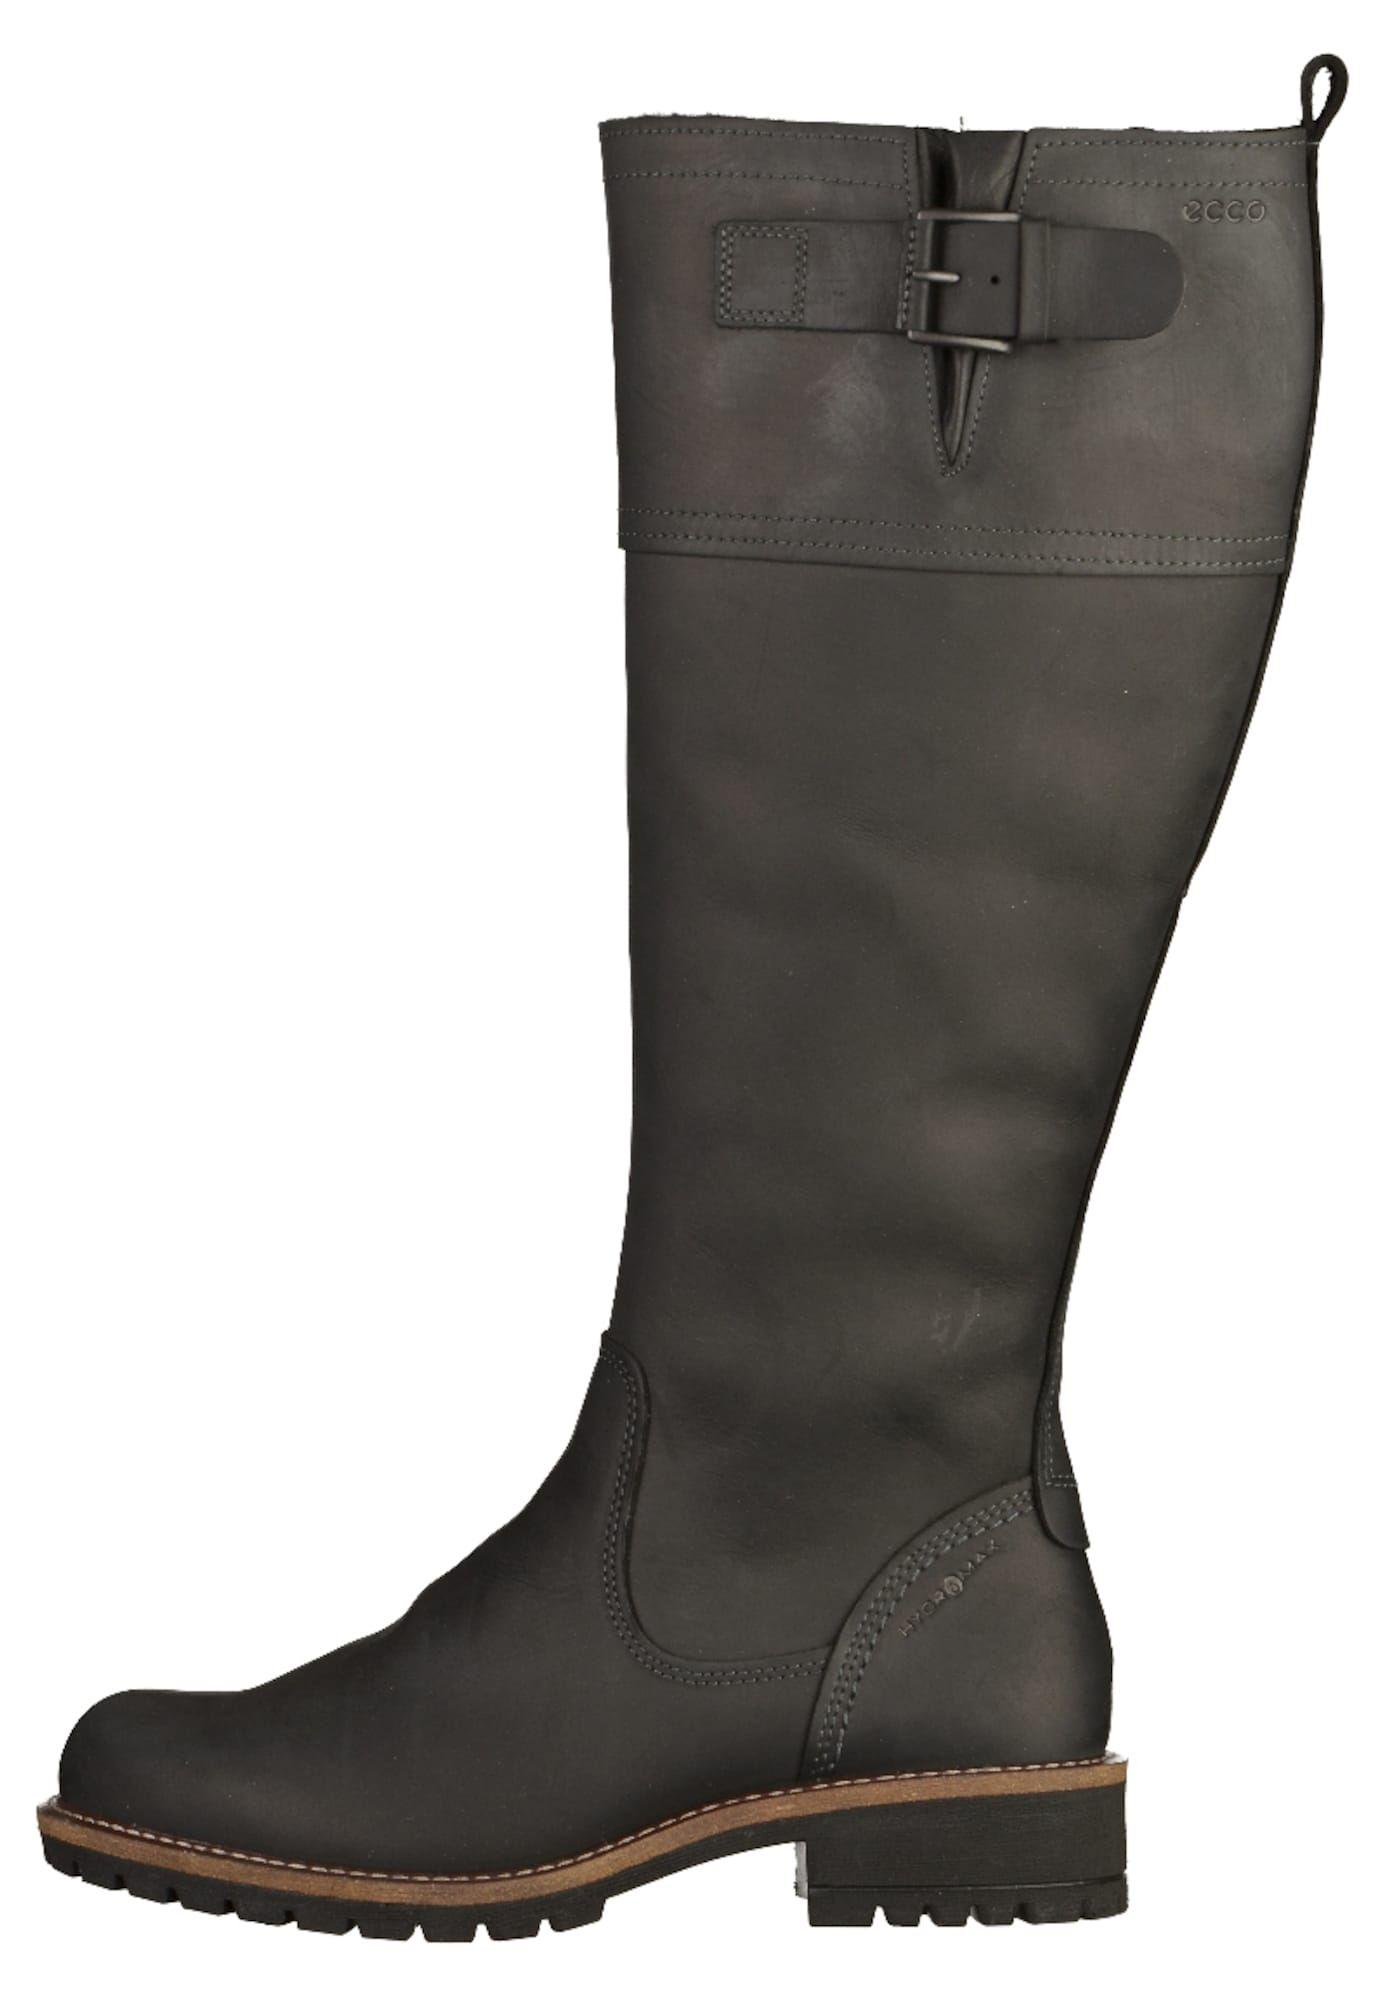 ECCO Stiefel Damen, Schwarz, Größe 37 | Ecco stiefel